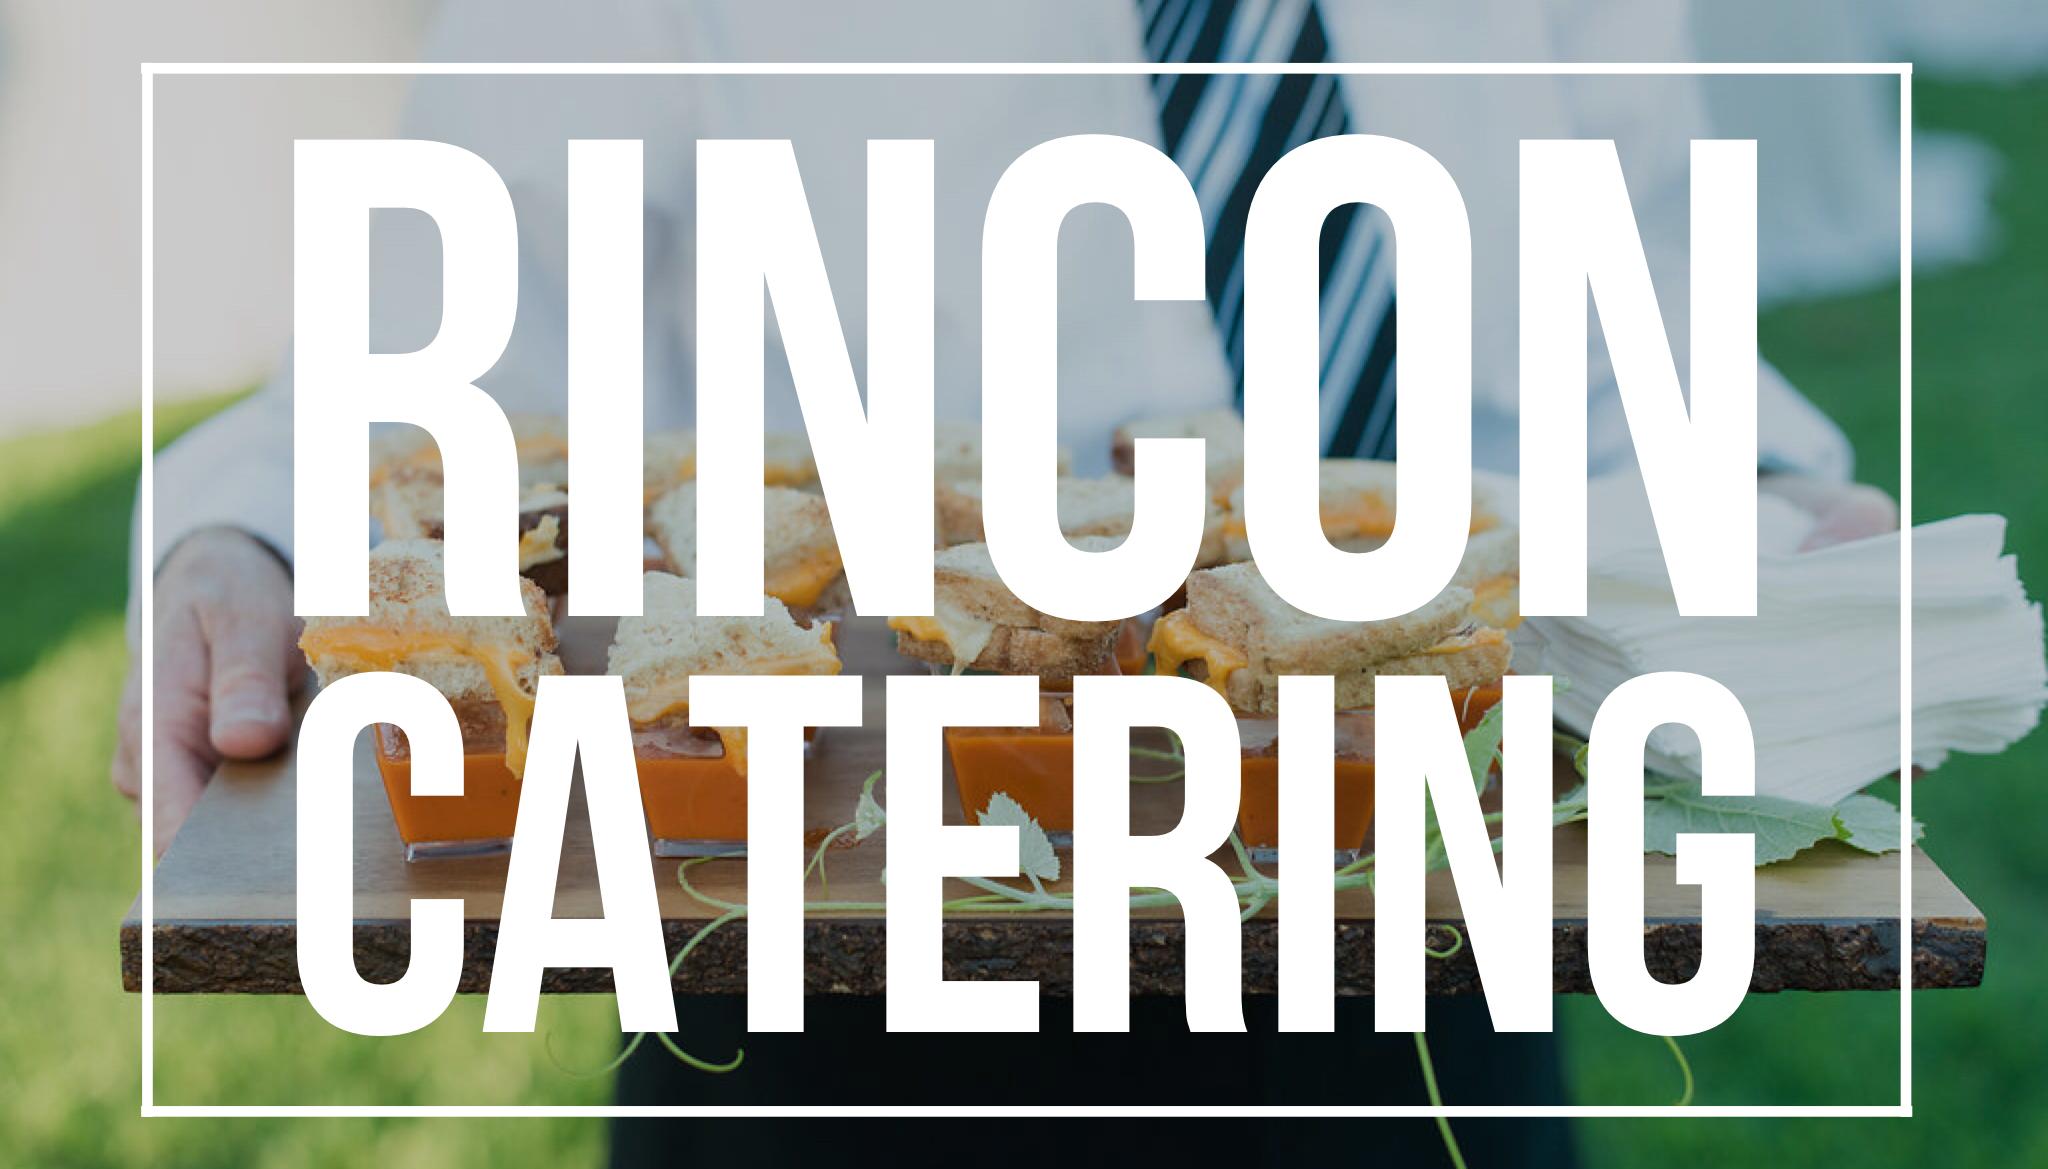 Event by Rincon - Catering Santa Barbara